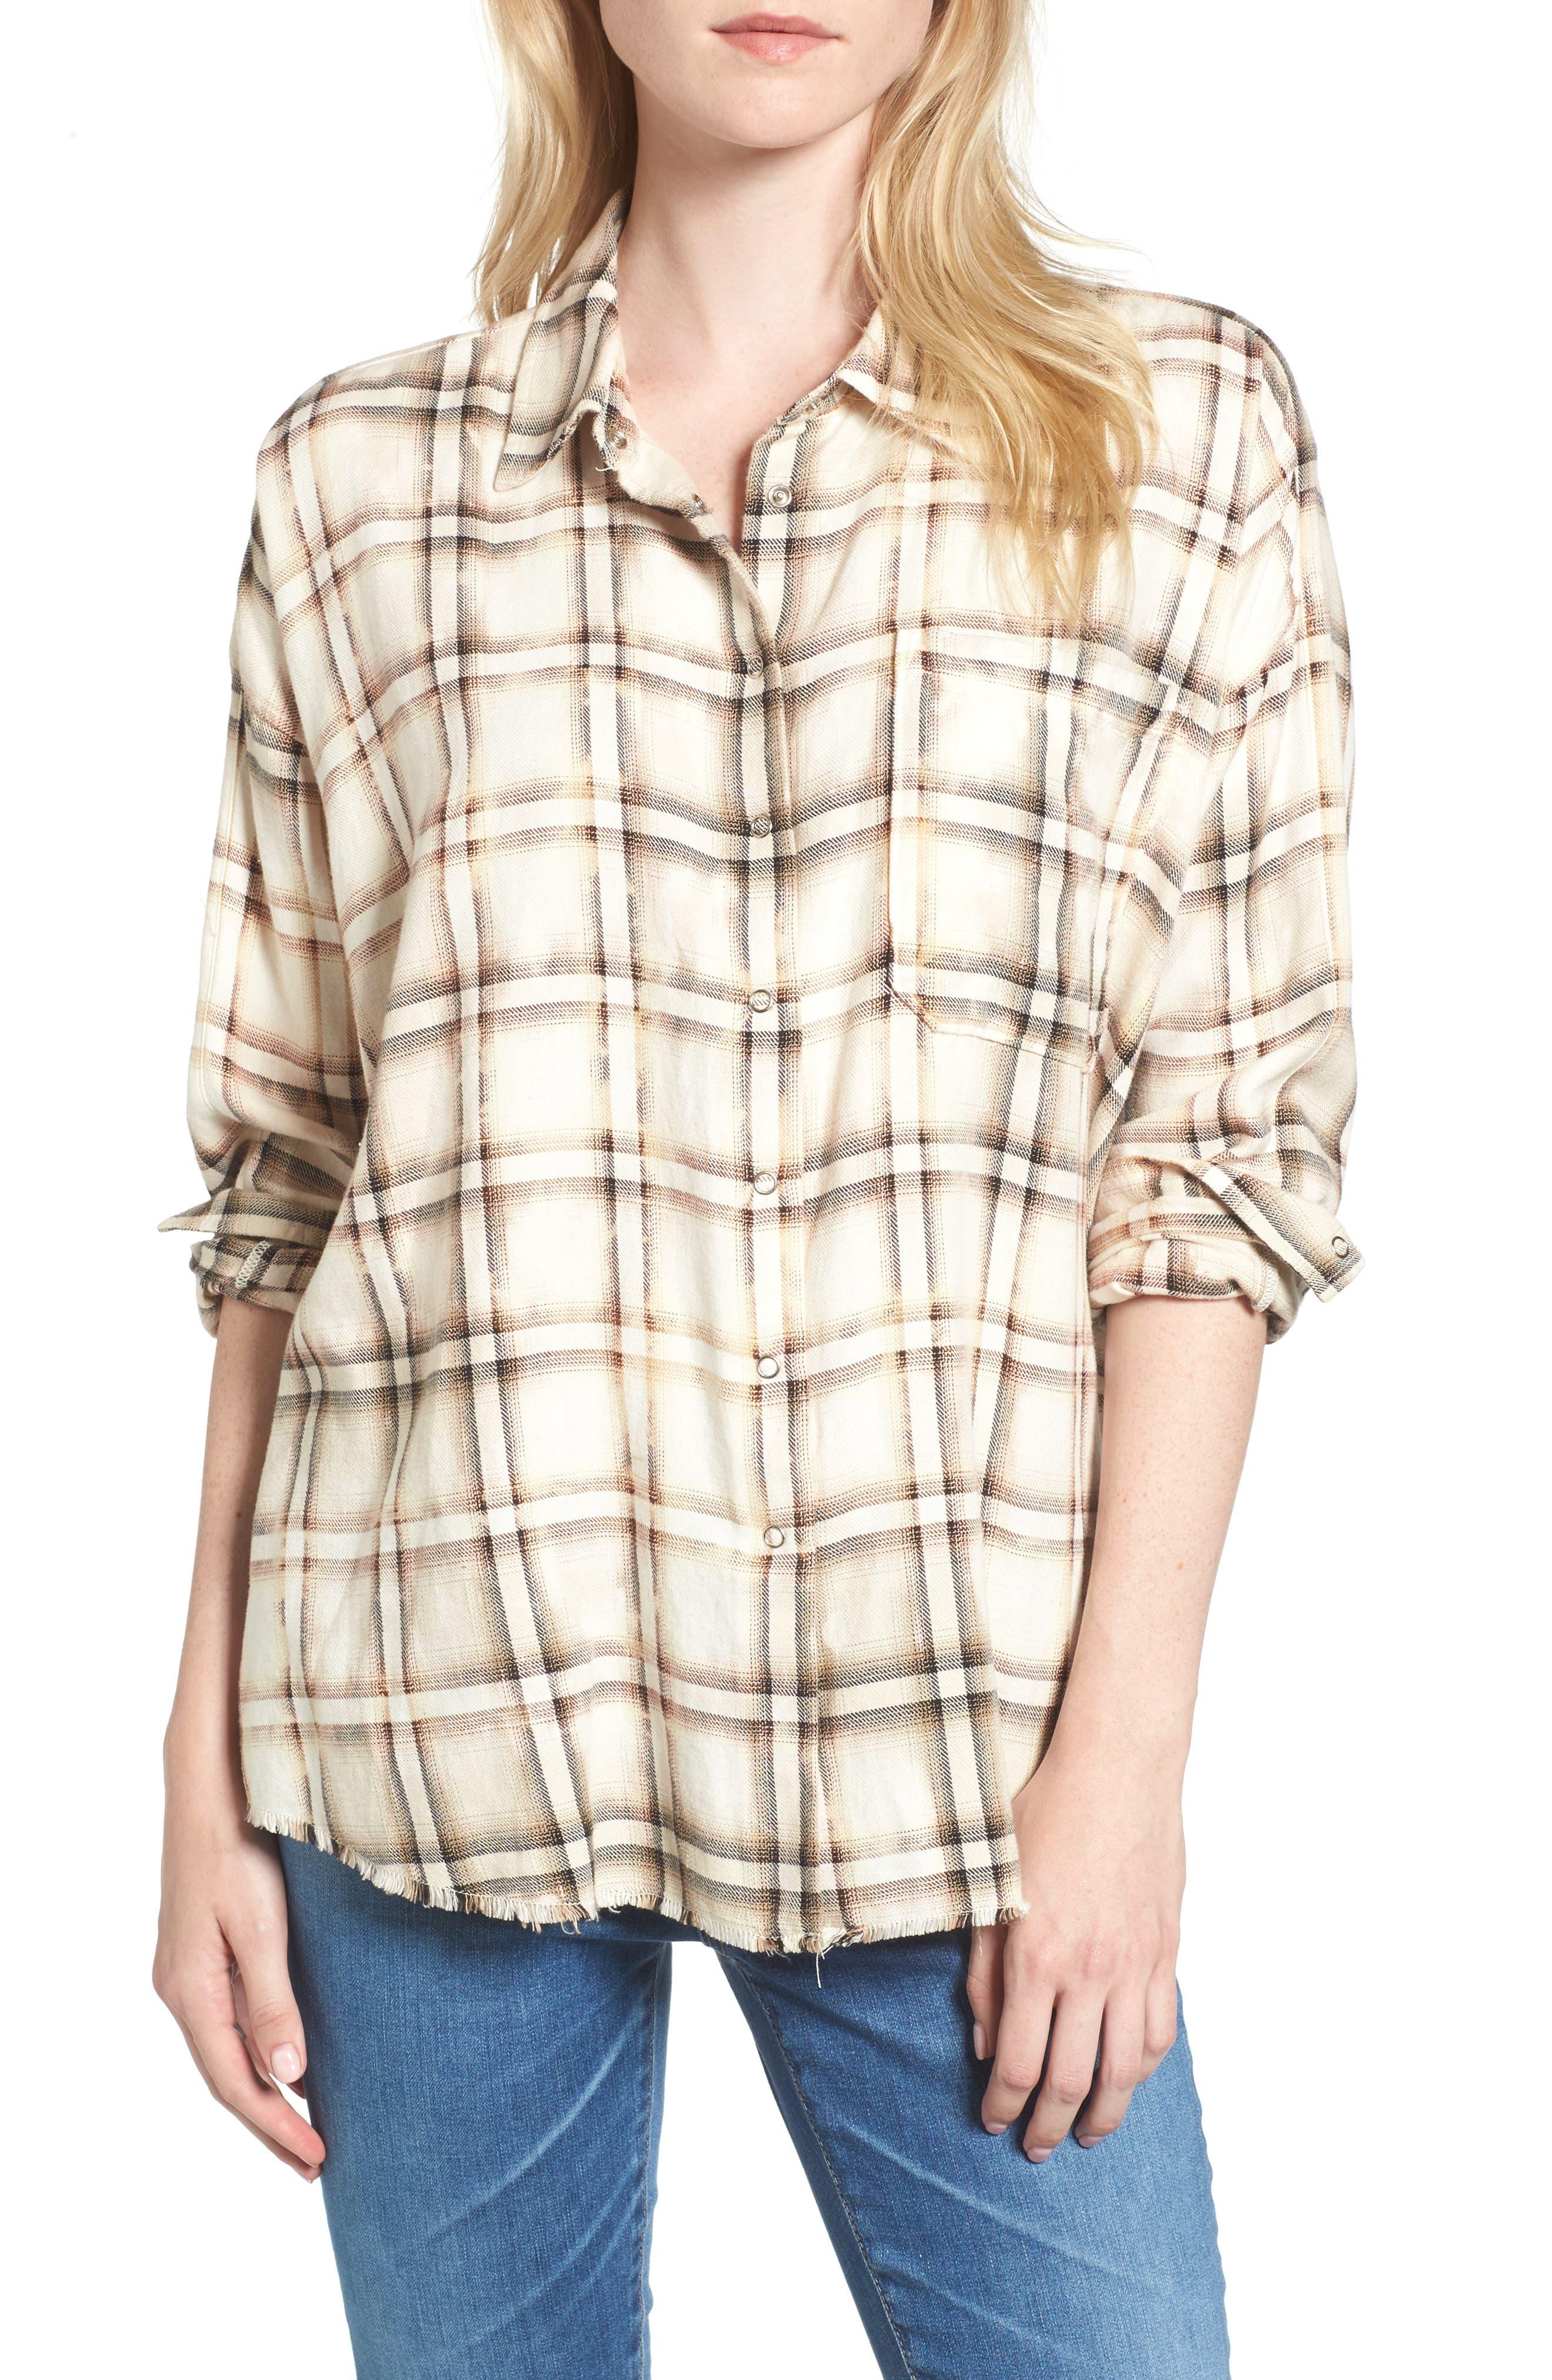 Josie Flannel Shirt,                         Main,                         color, 909